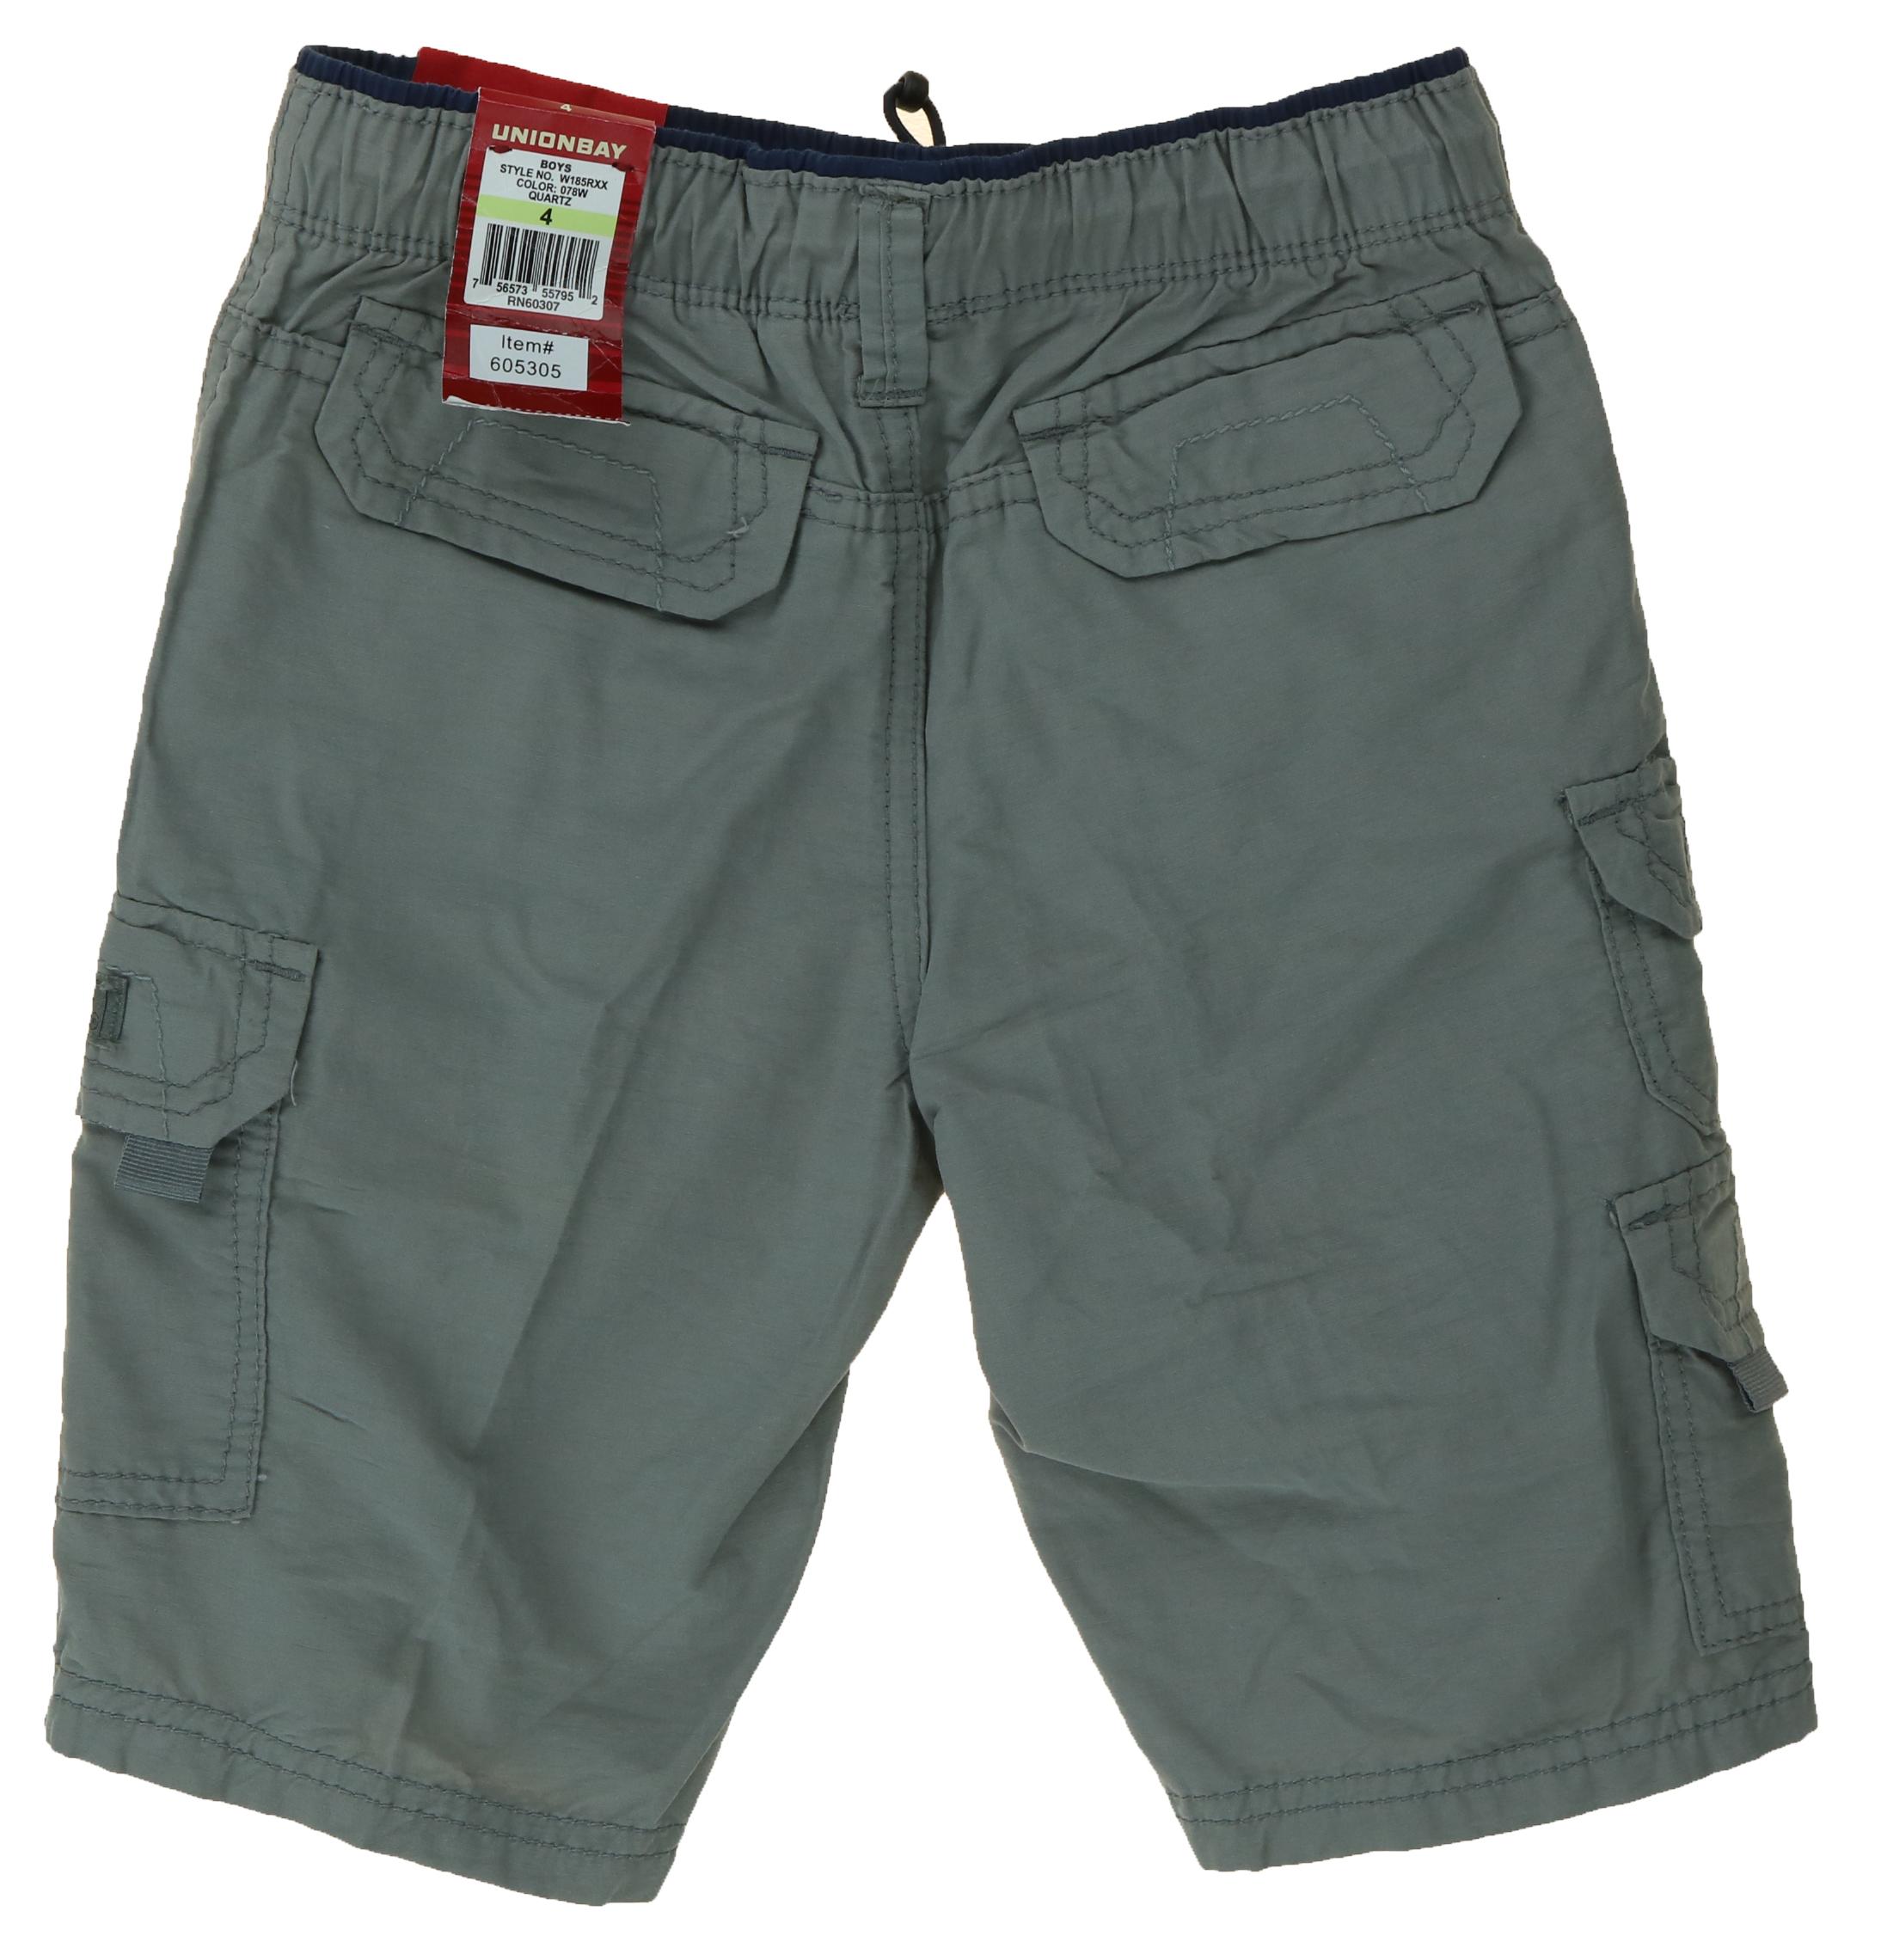 Elastic Waistband FREE SHIP UNIONBAY Lightweight Pull-On Cargo Shorts for Boys